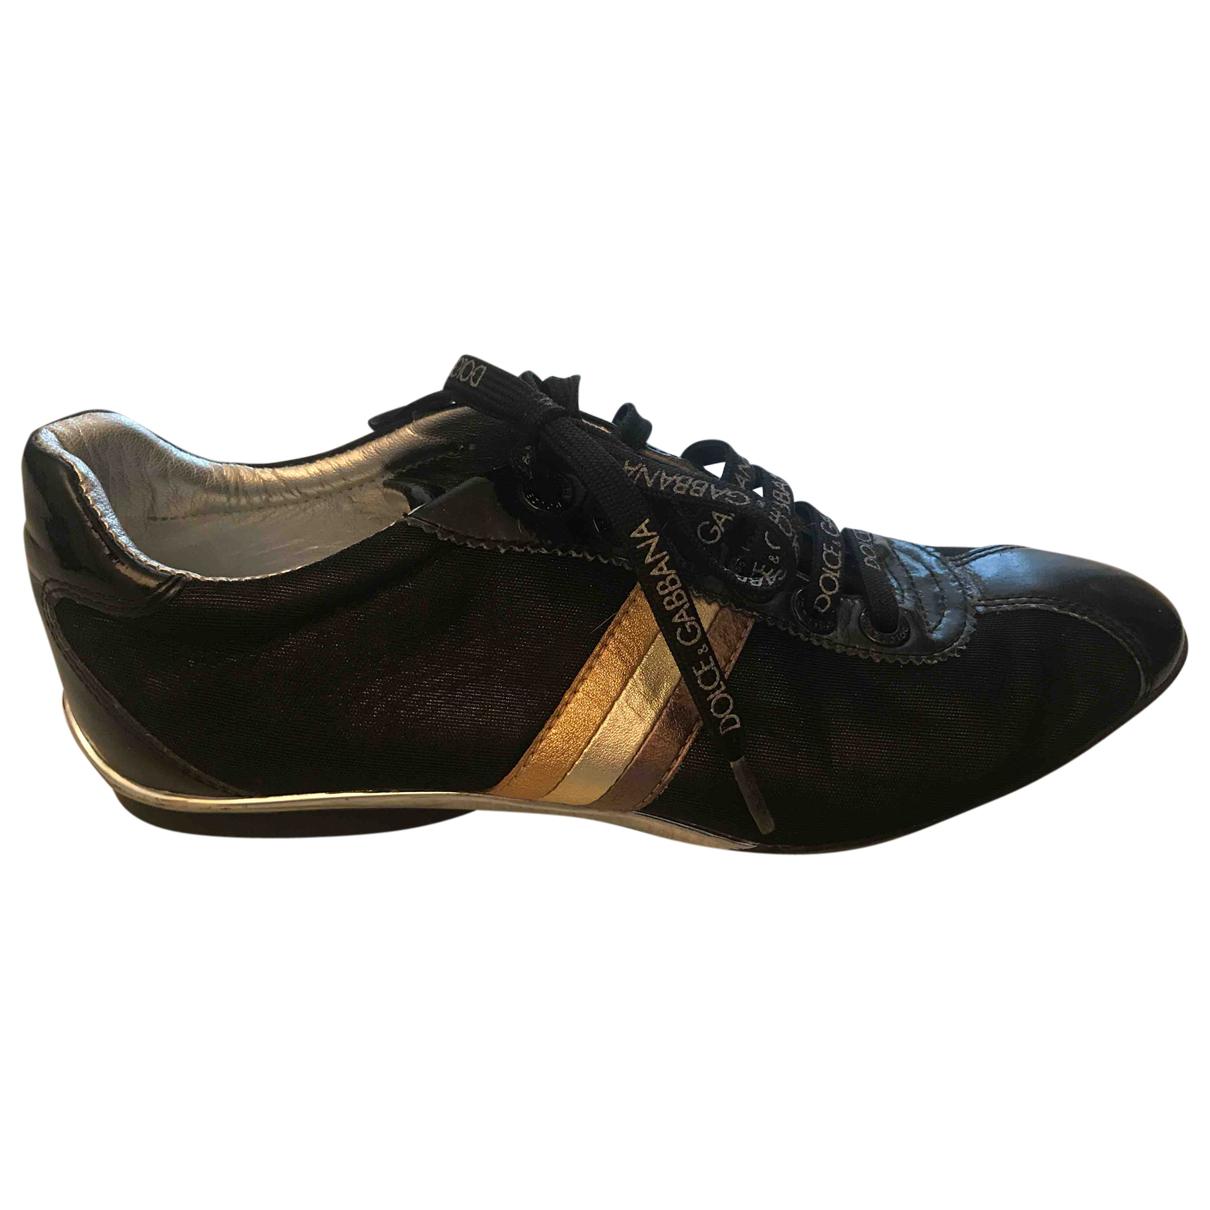 Dolce & Gabbana \N Sneakers in  Schwarz Polyester